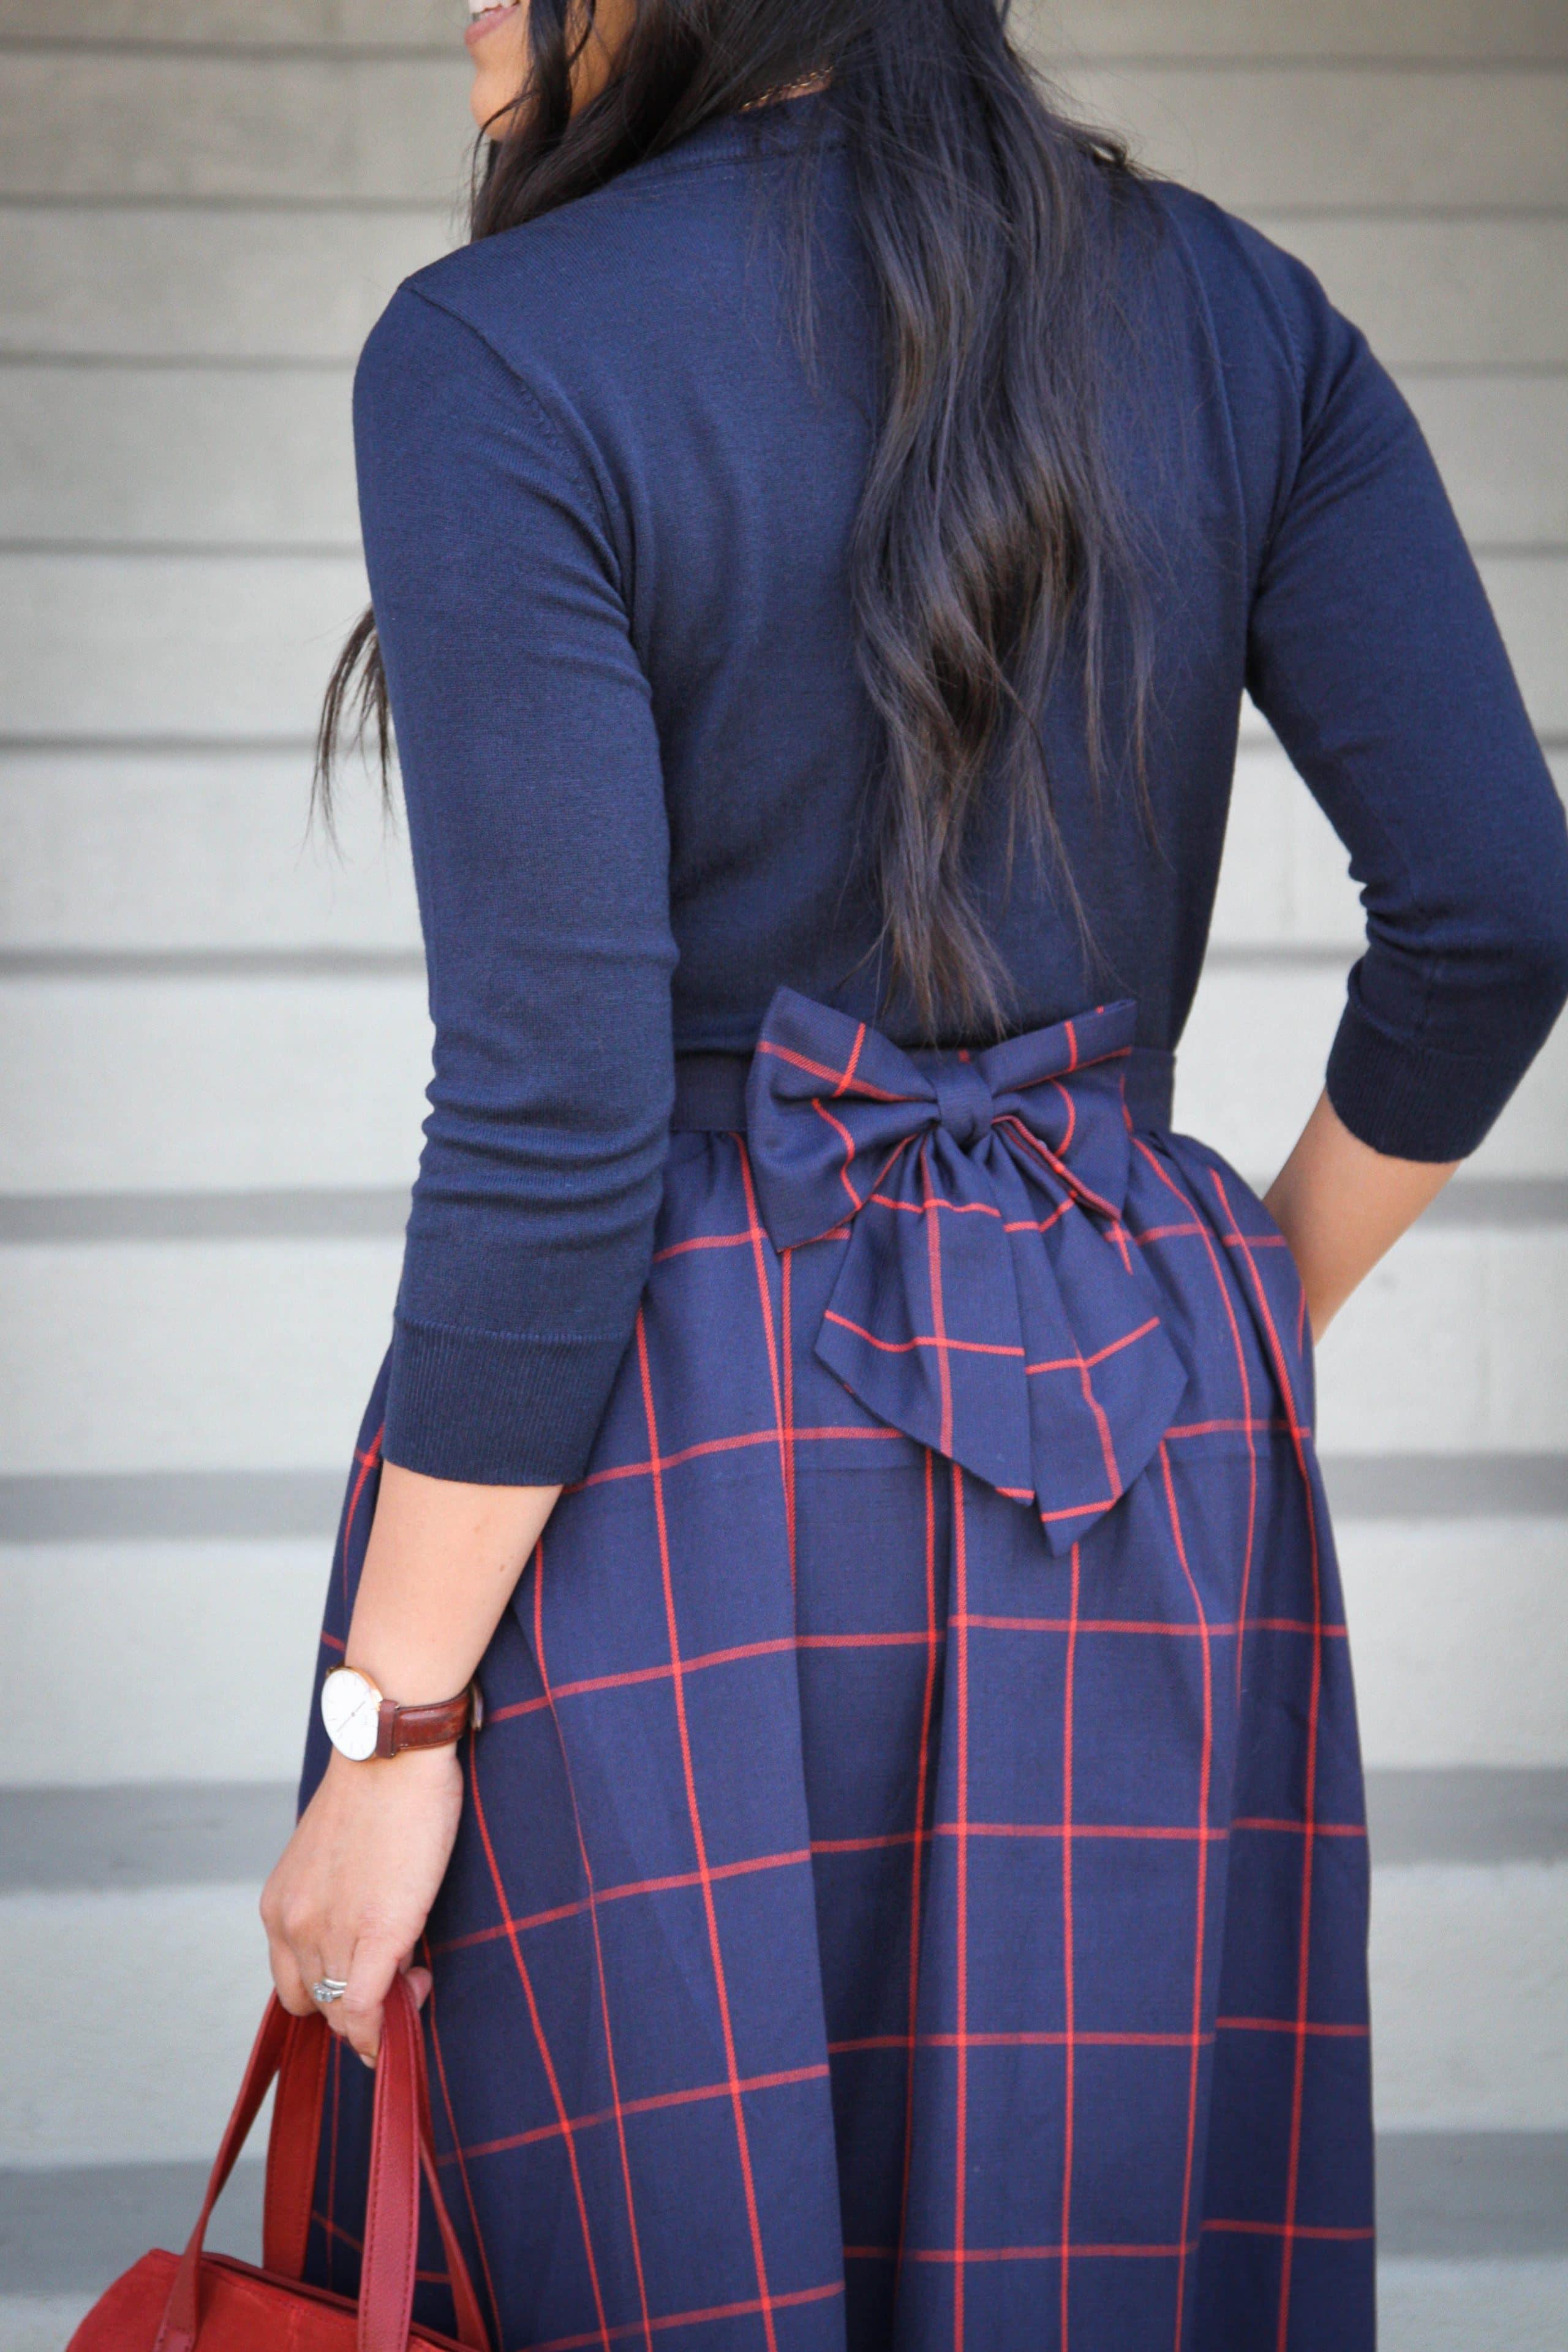 Navy Sweater + Bow detail back of skirt